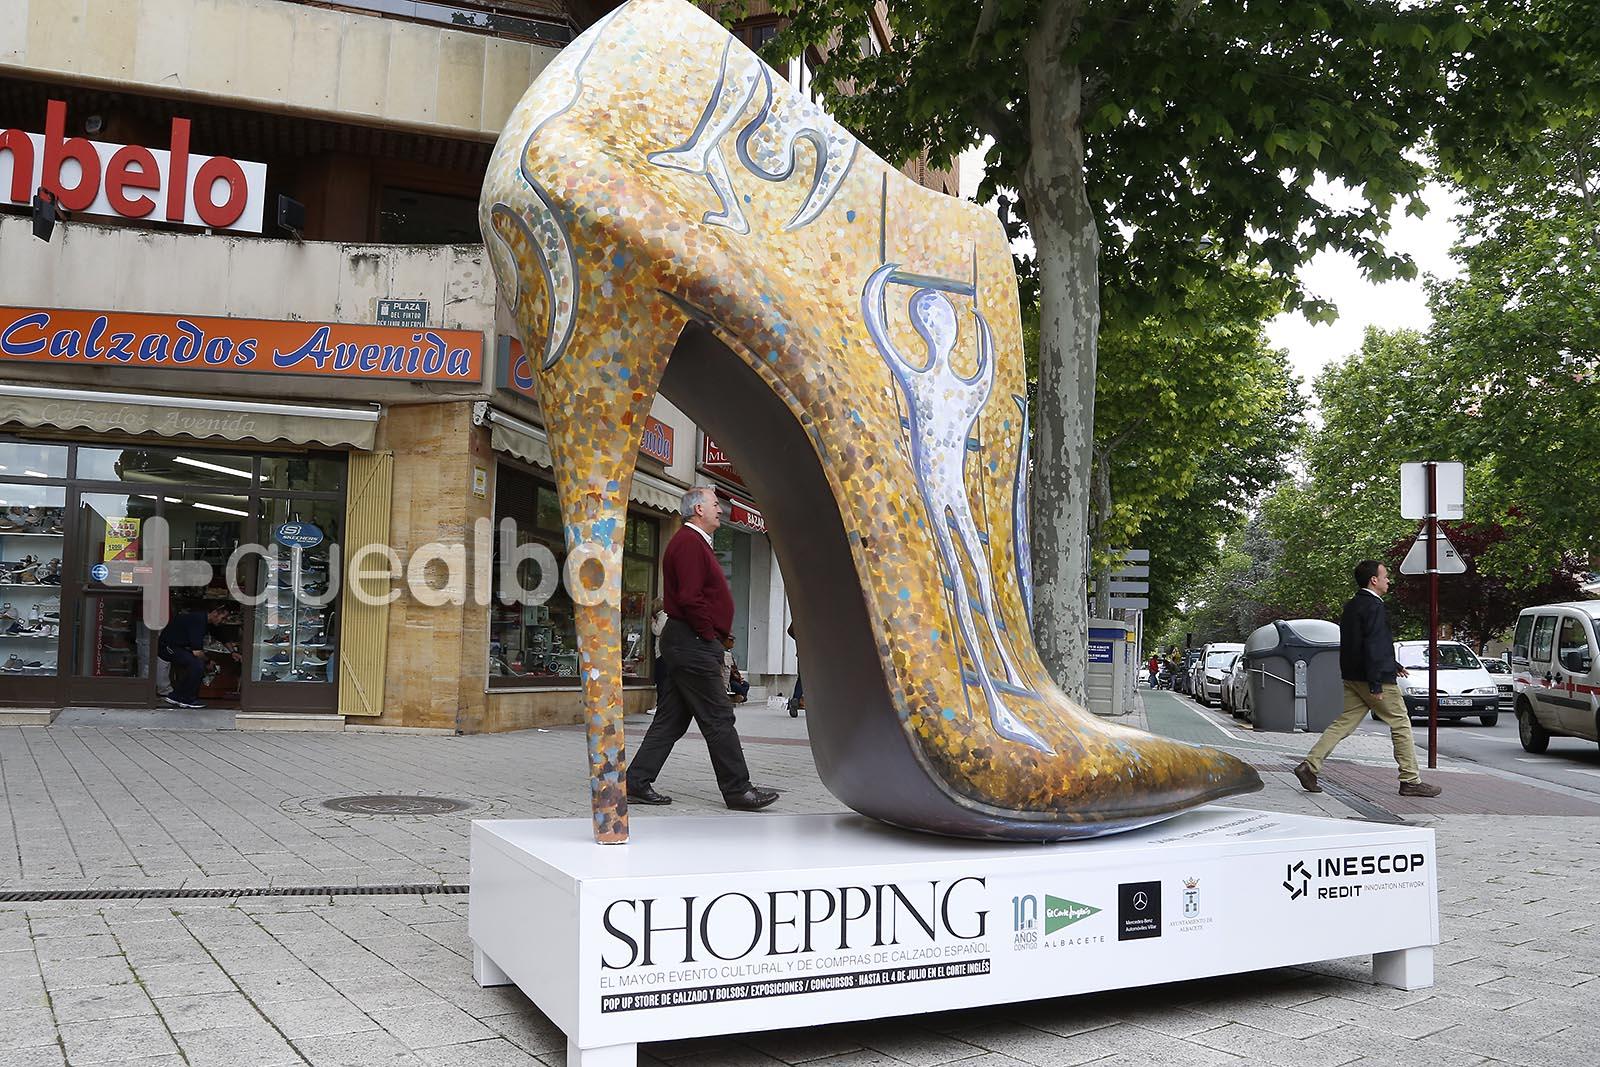 8cfb0421e58 ... Click to enlarge image zapatos-corte-ingles-avenida-espana-albacete- ...